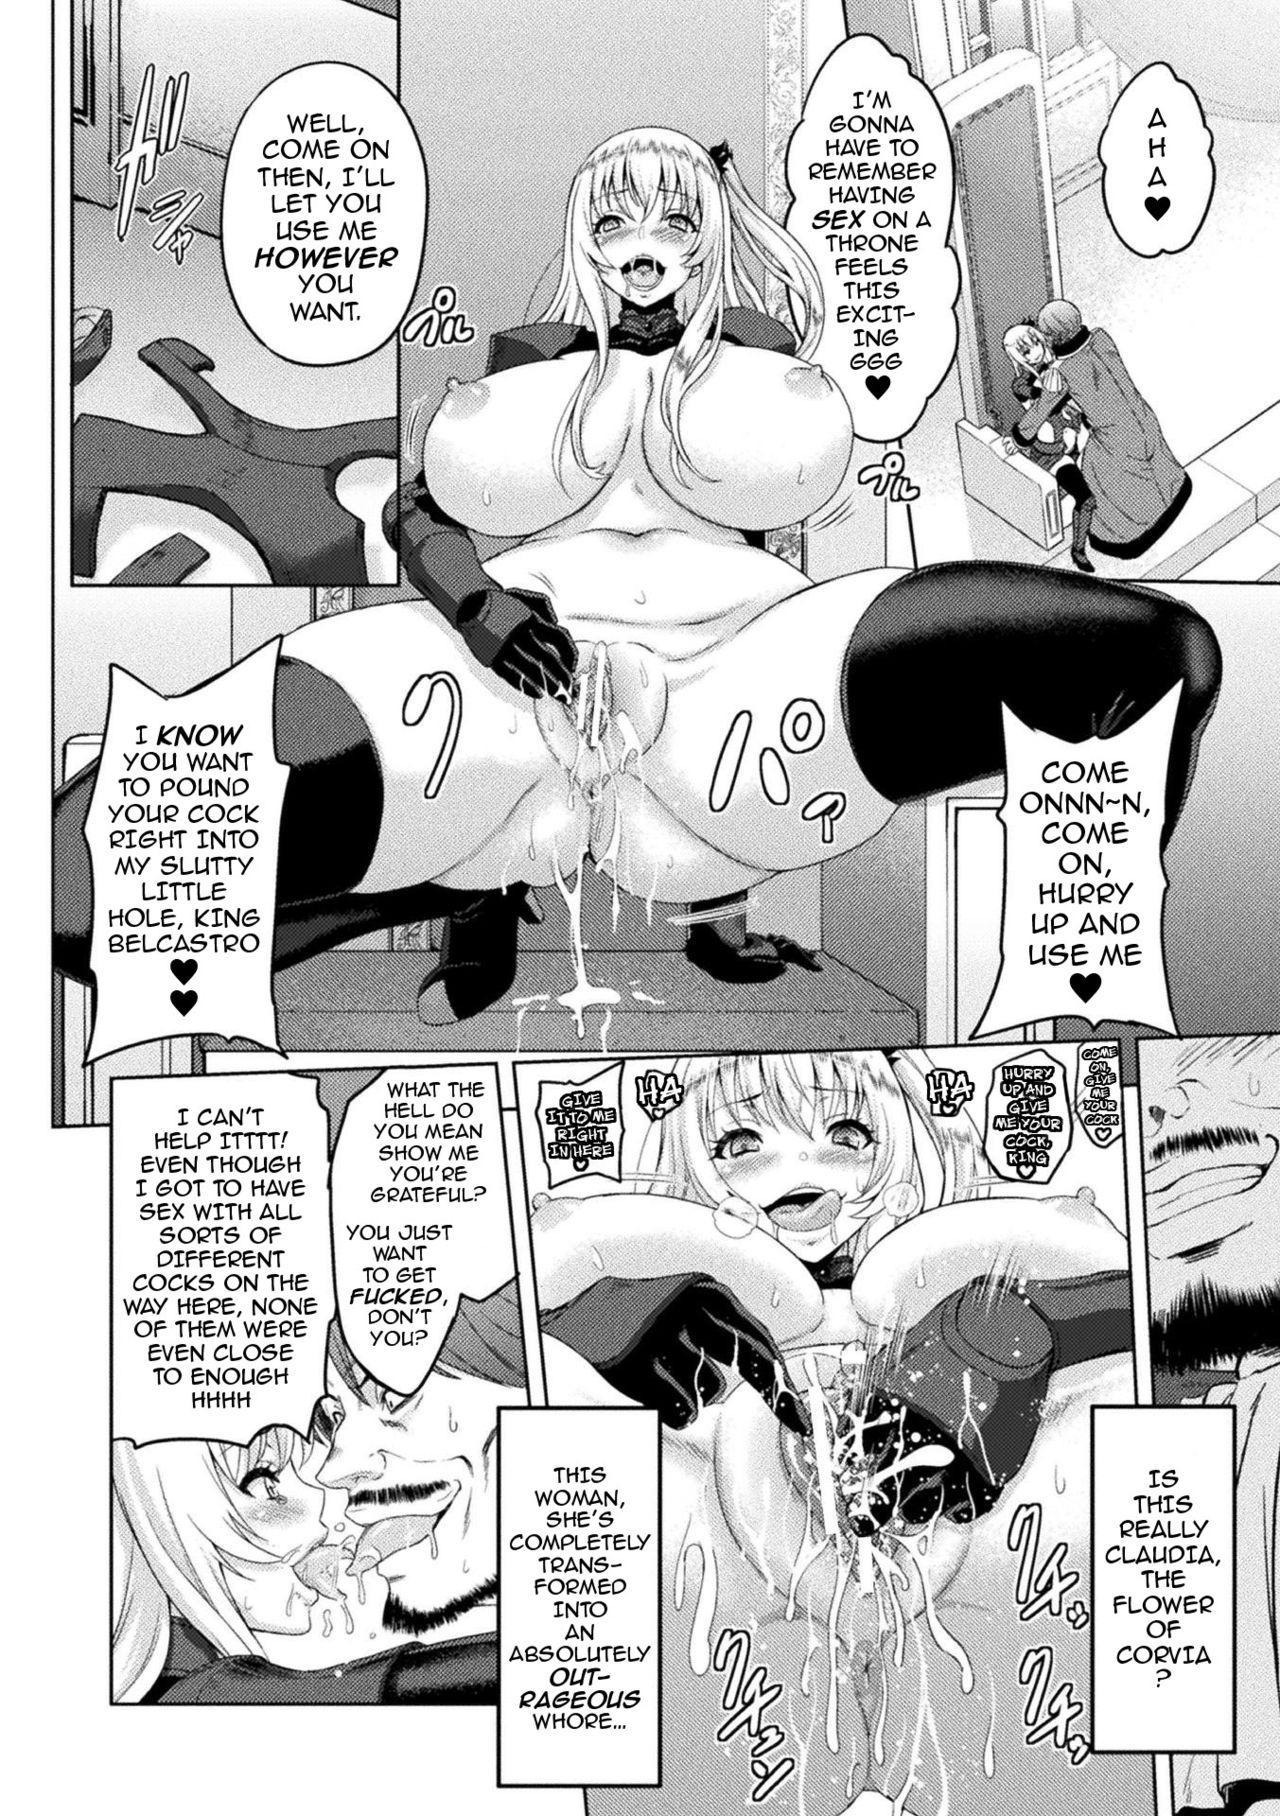 [Yamada Gogogo] Erona ~Orc no Inmon ni Okasareta Onna Kishi no Matsuro~ | Erona ~The Fall of a Beautiful Knight Cursed with the Lewd Mark of an Orc~ [English] {darknight} 82